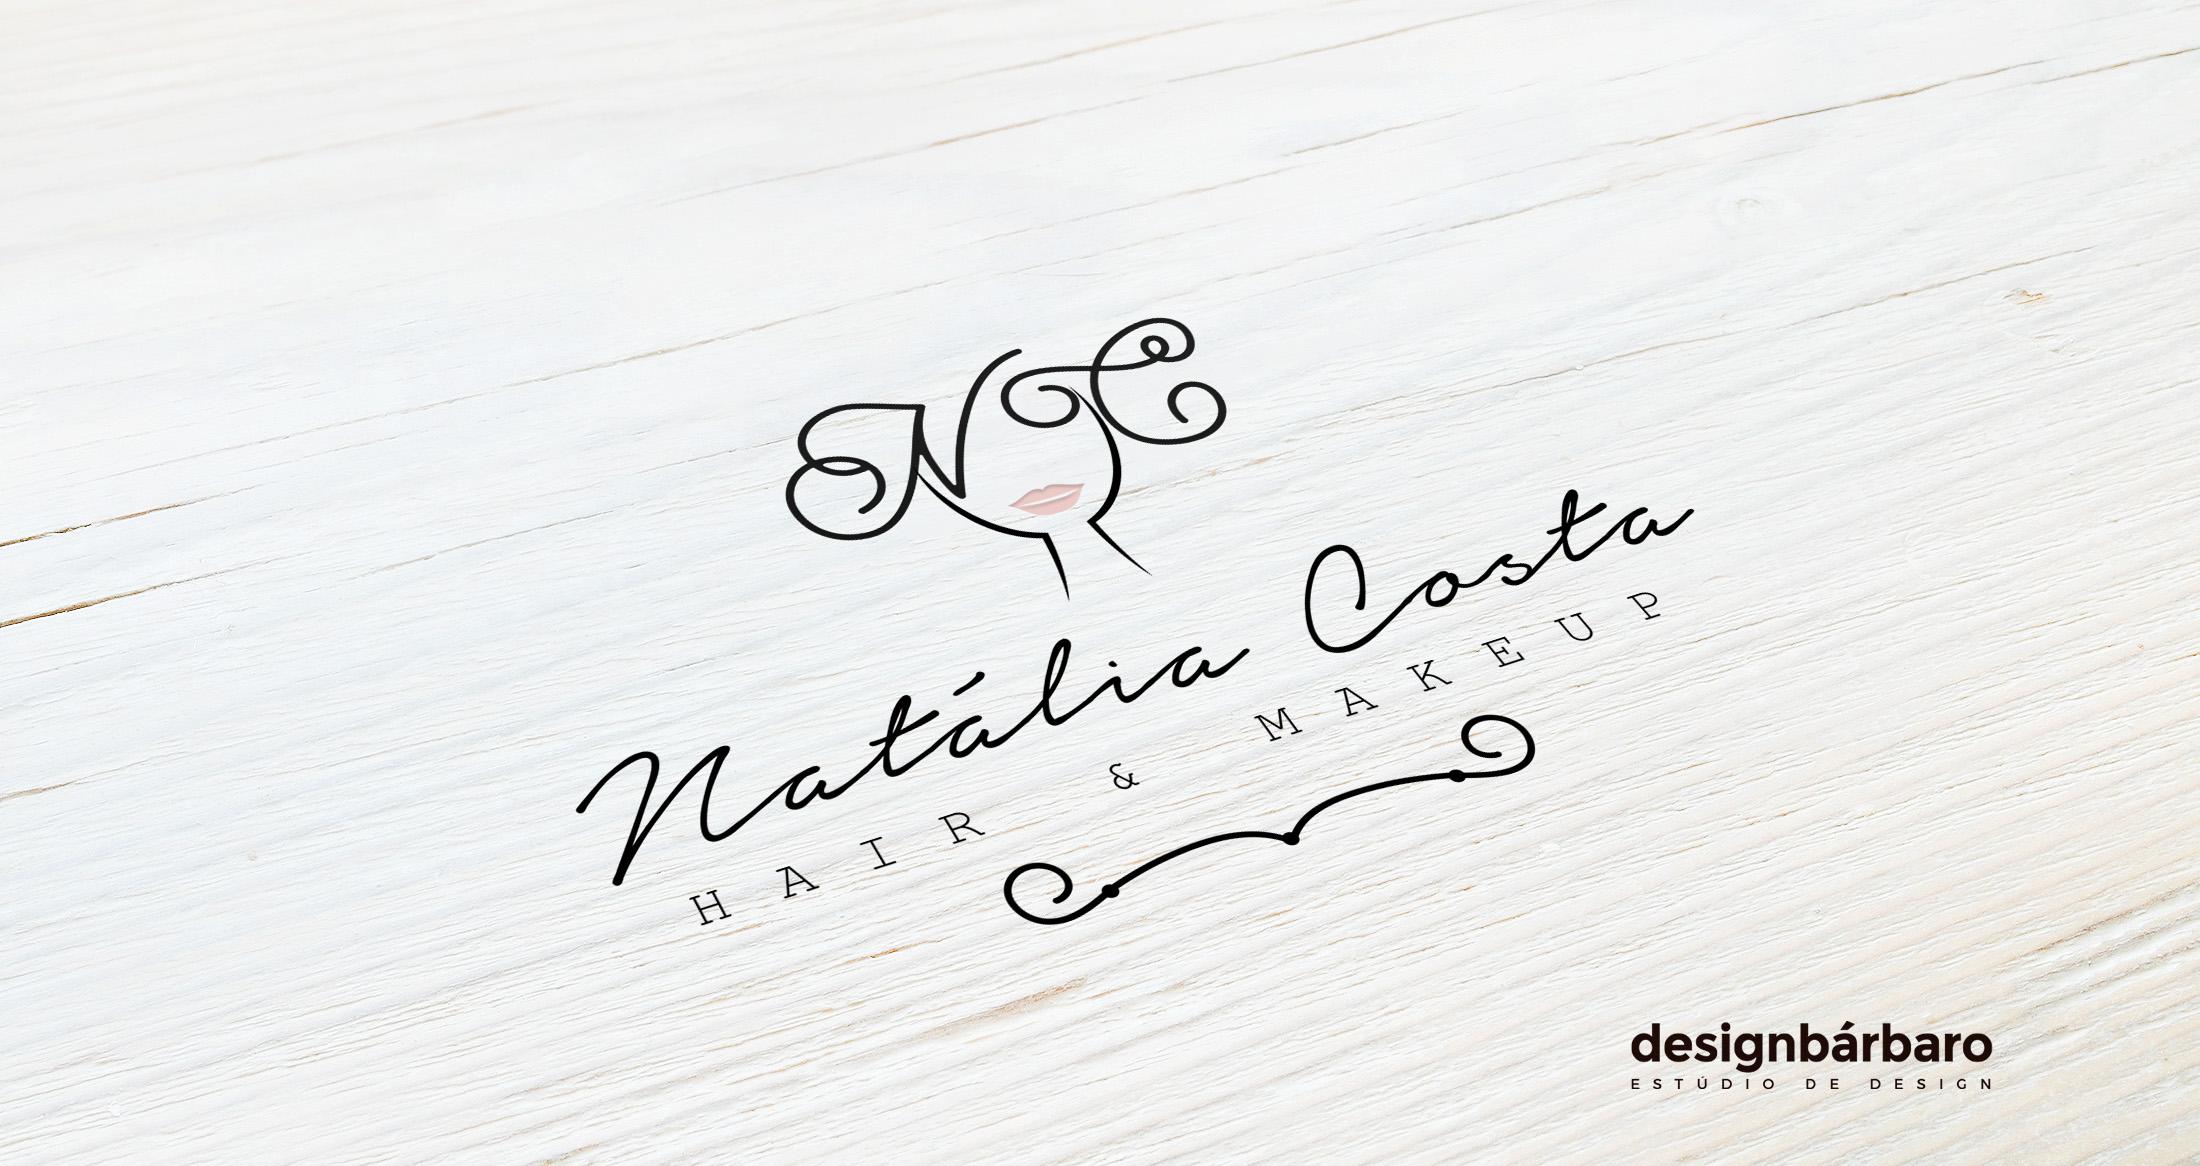 Natália Costa